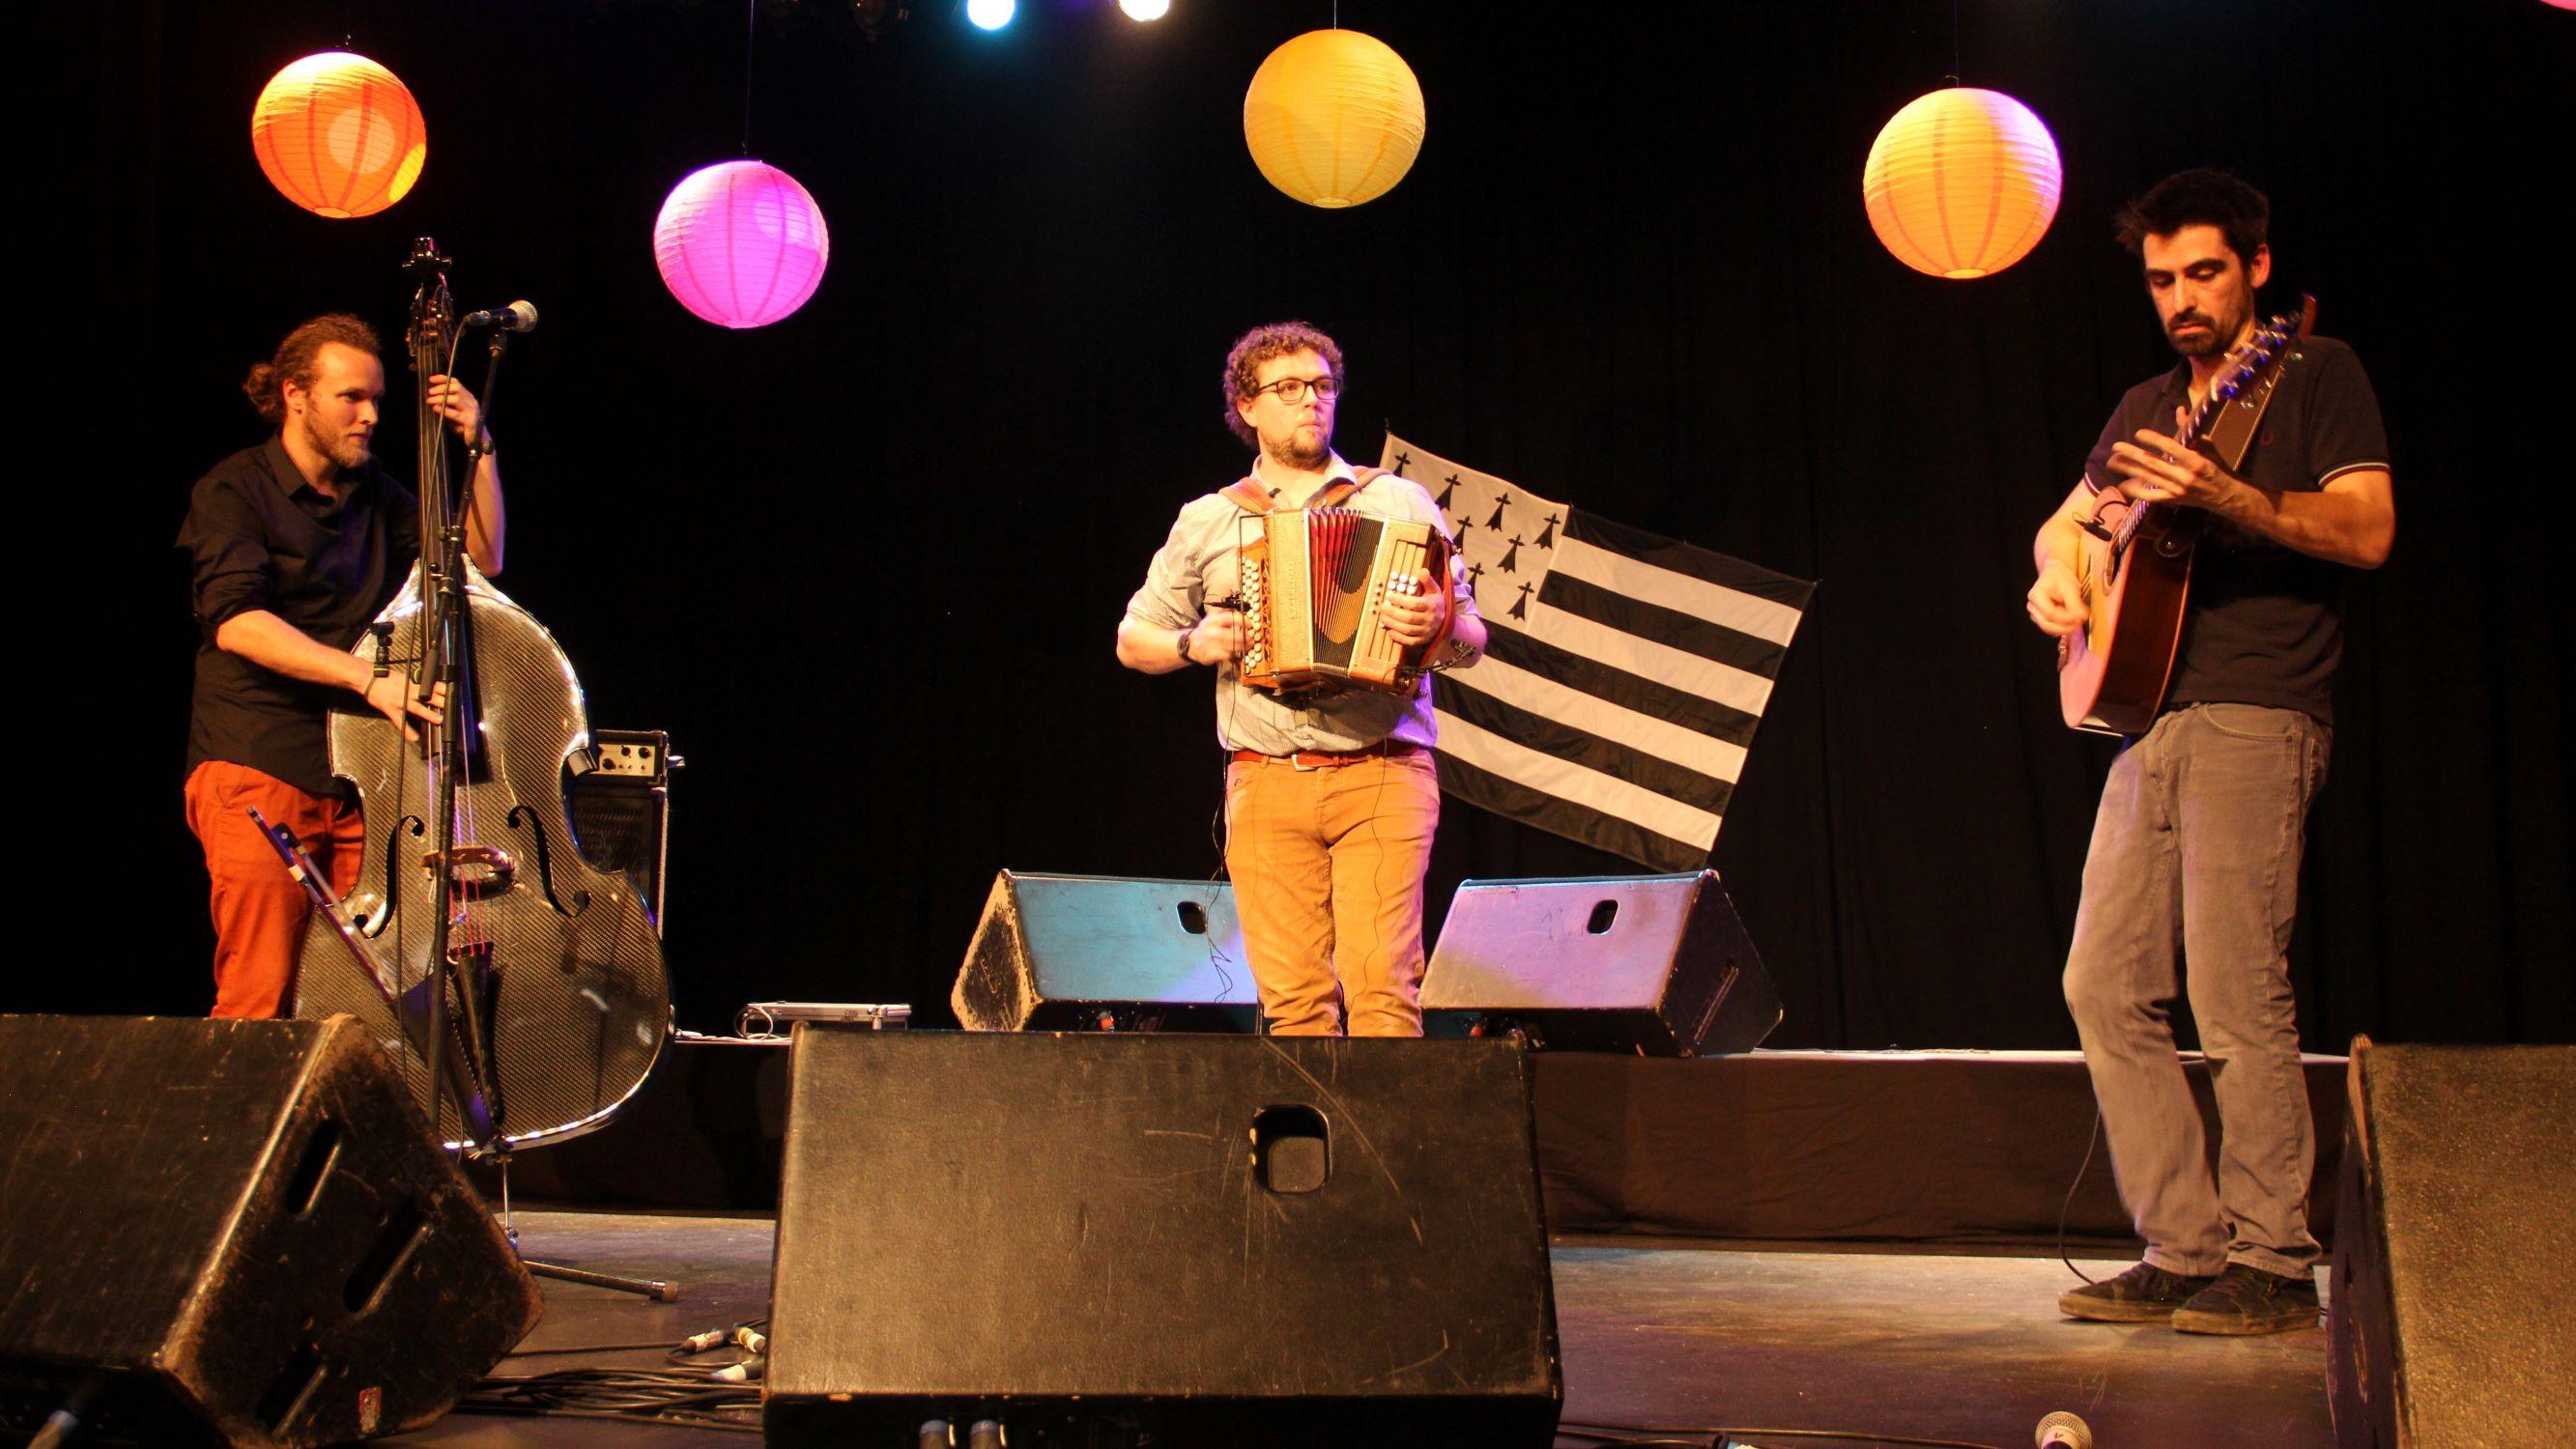 2020-02-01-Fest-Noz-Anniversaire-40-ans-Koria-Fest-Noz-06L